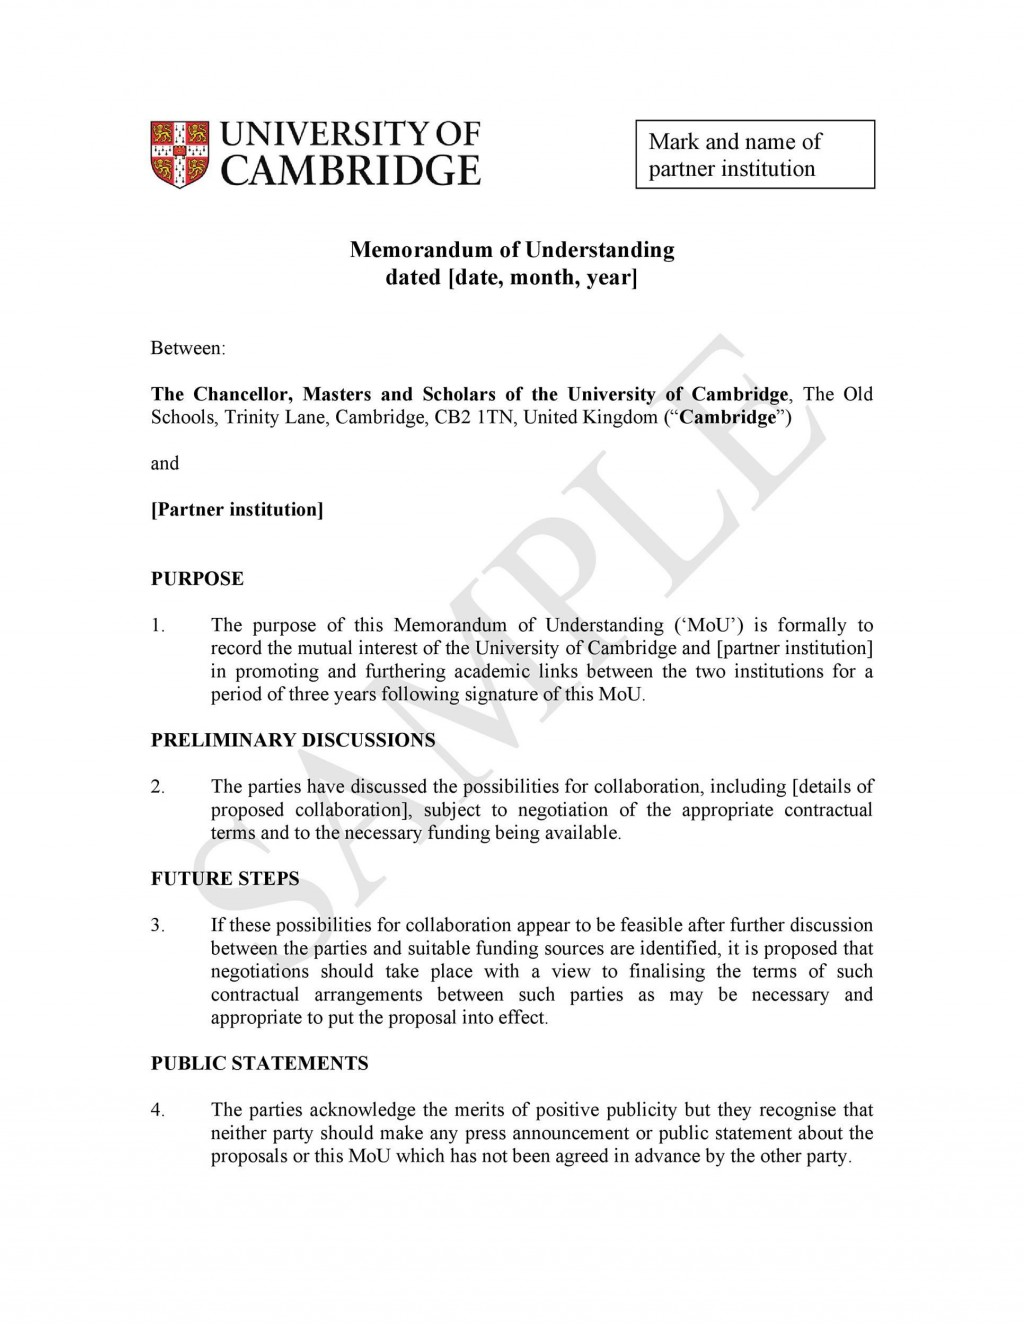 005 Striking Letter Of Understanding Sample Format Highest Clarity Large